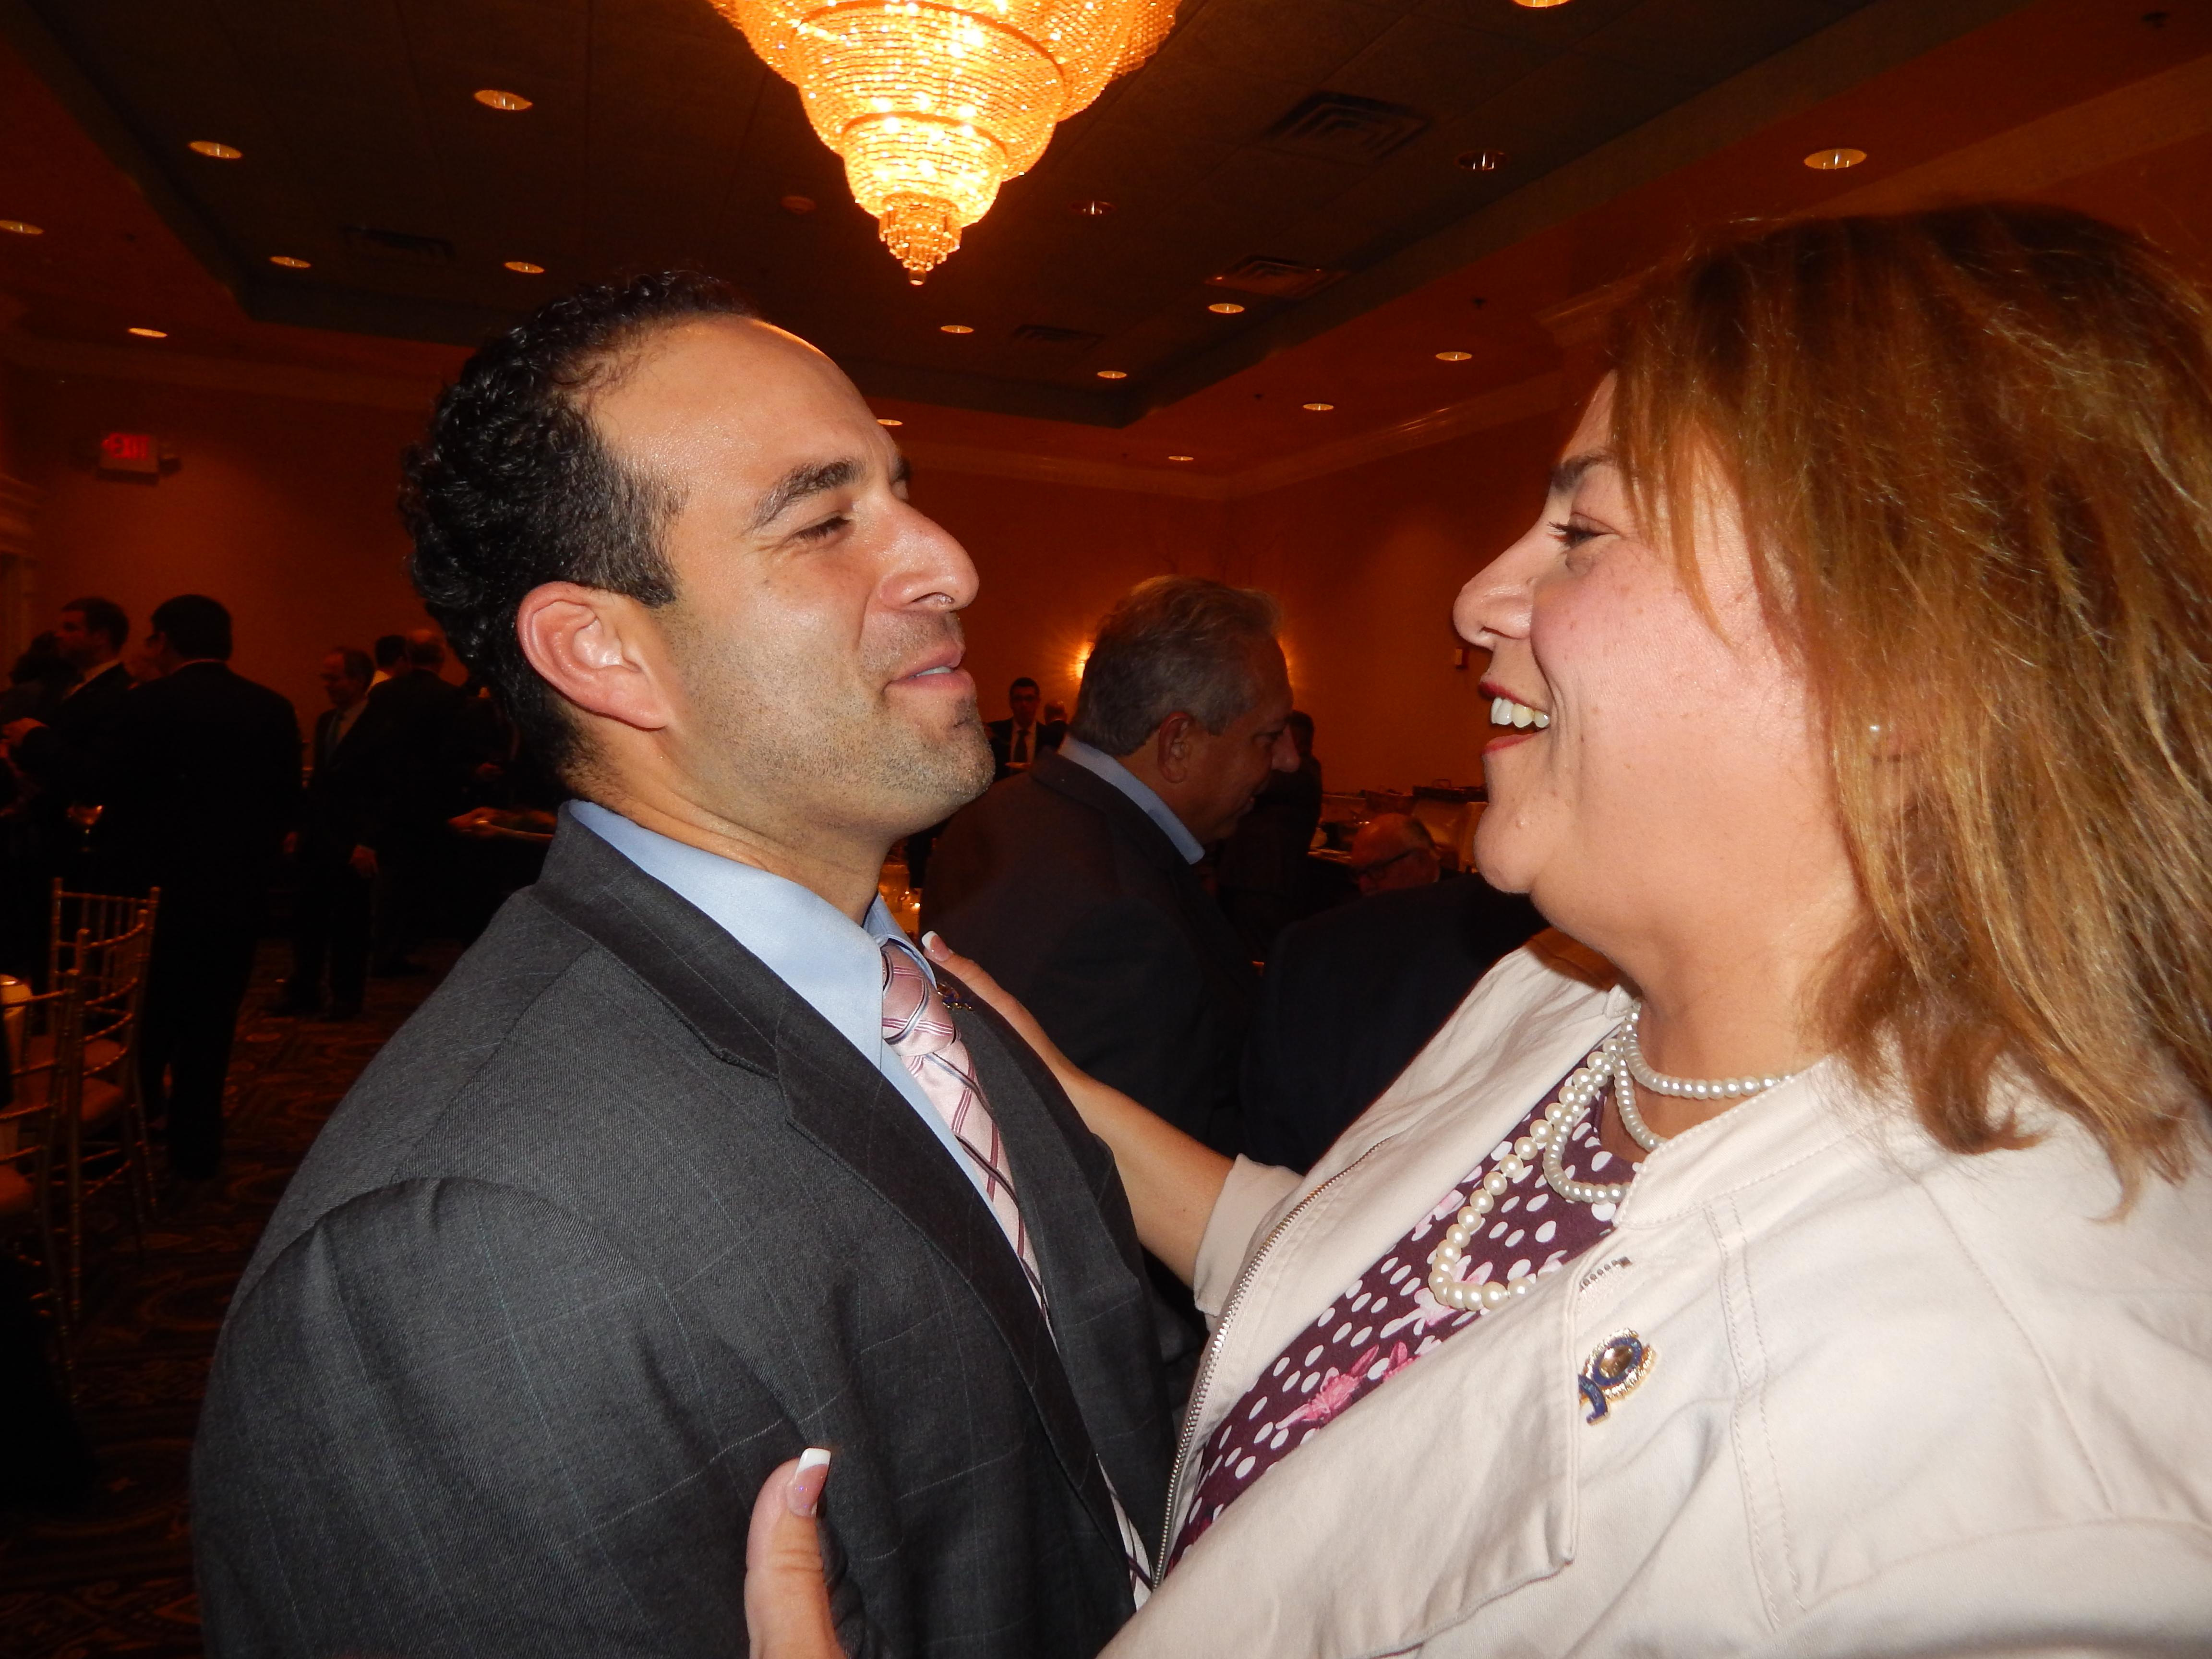 Assemblyman Carmelo Garcia (D-33) and Assemblywoman Angelica Jimenez (D-32)